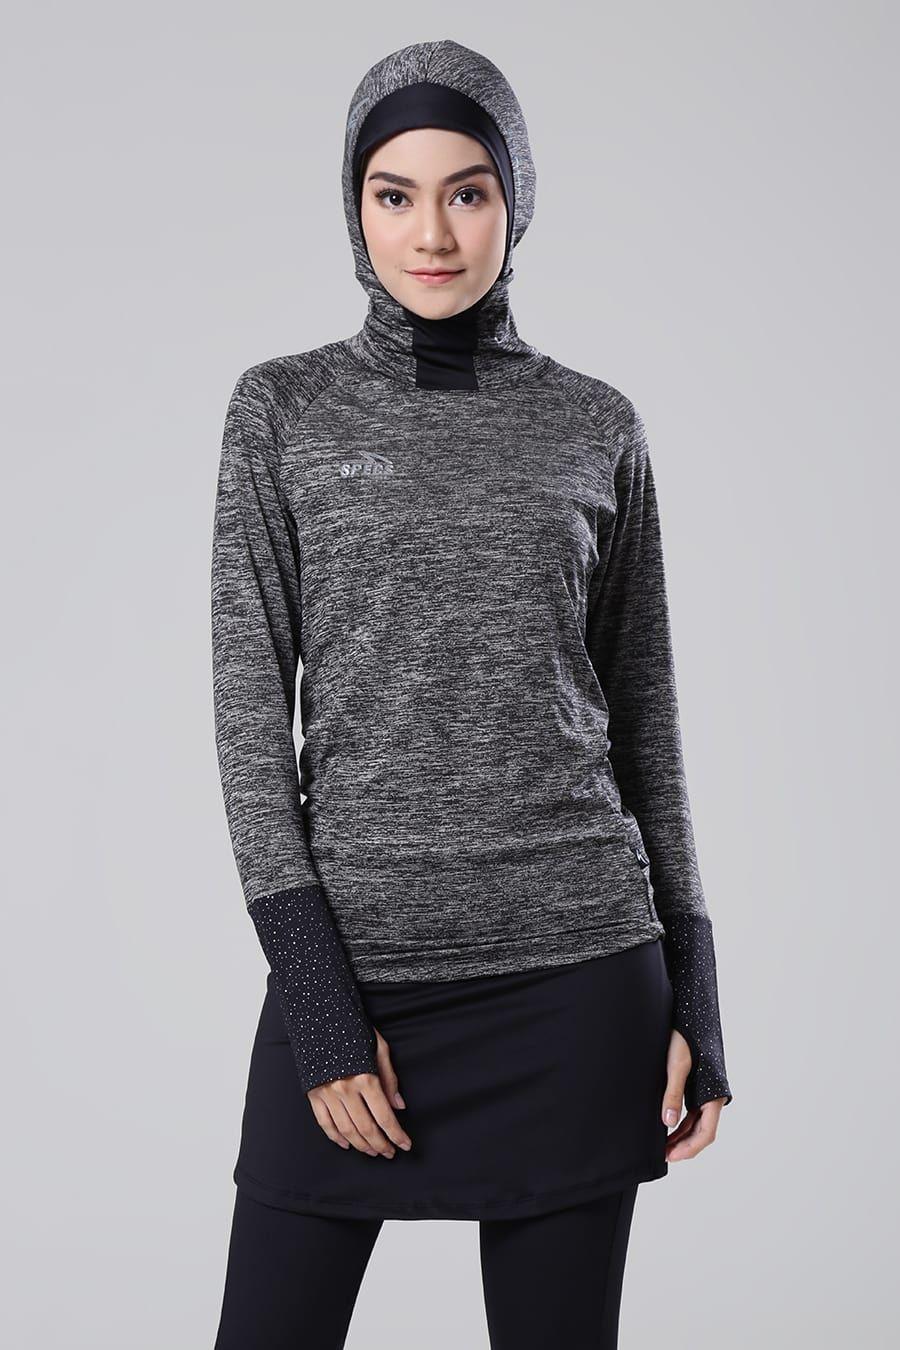 esorra hijab cap baselayer ls w hijab kaos muslim